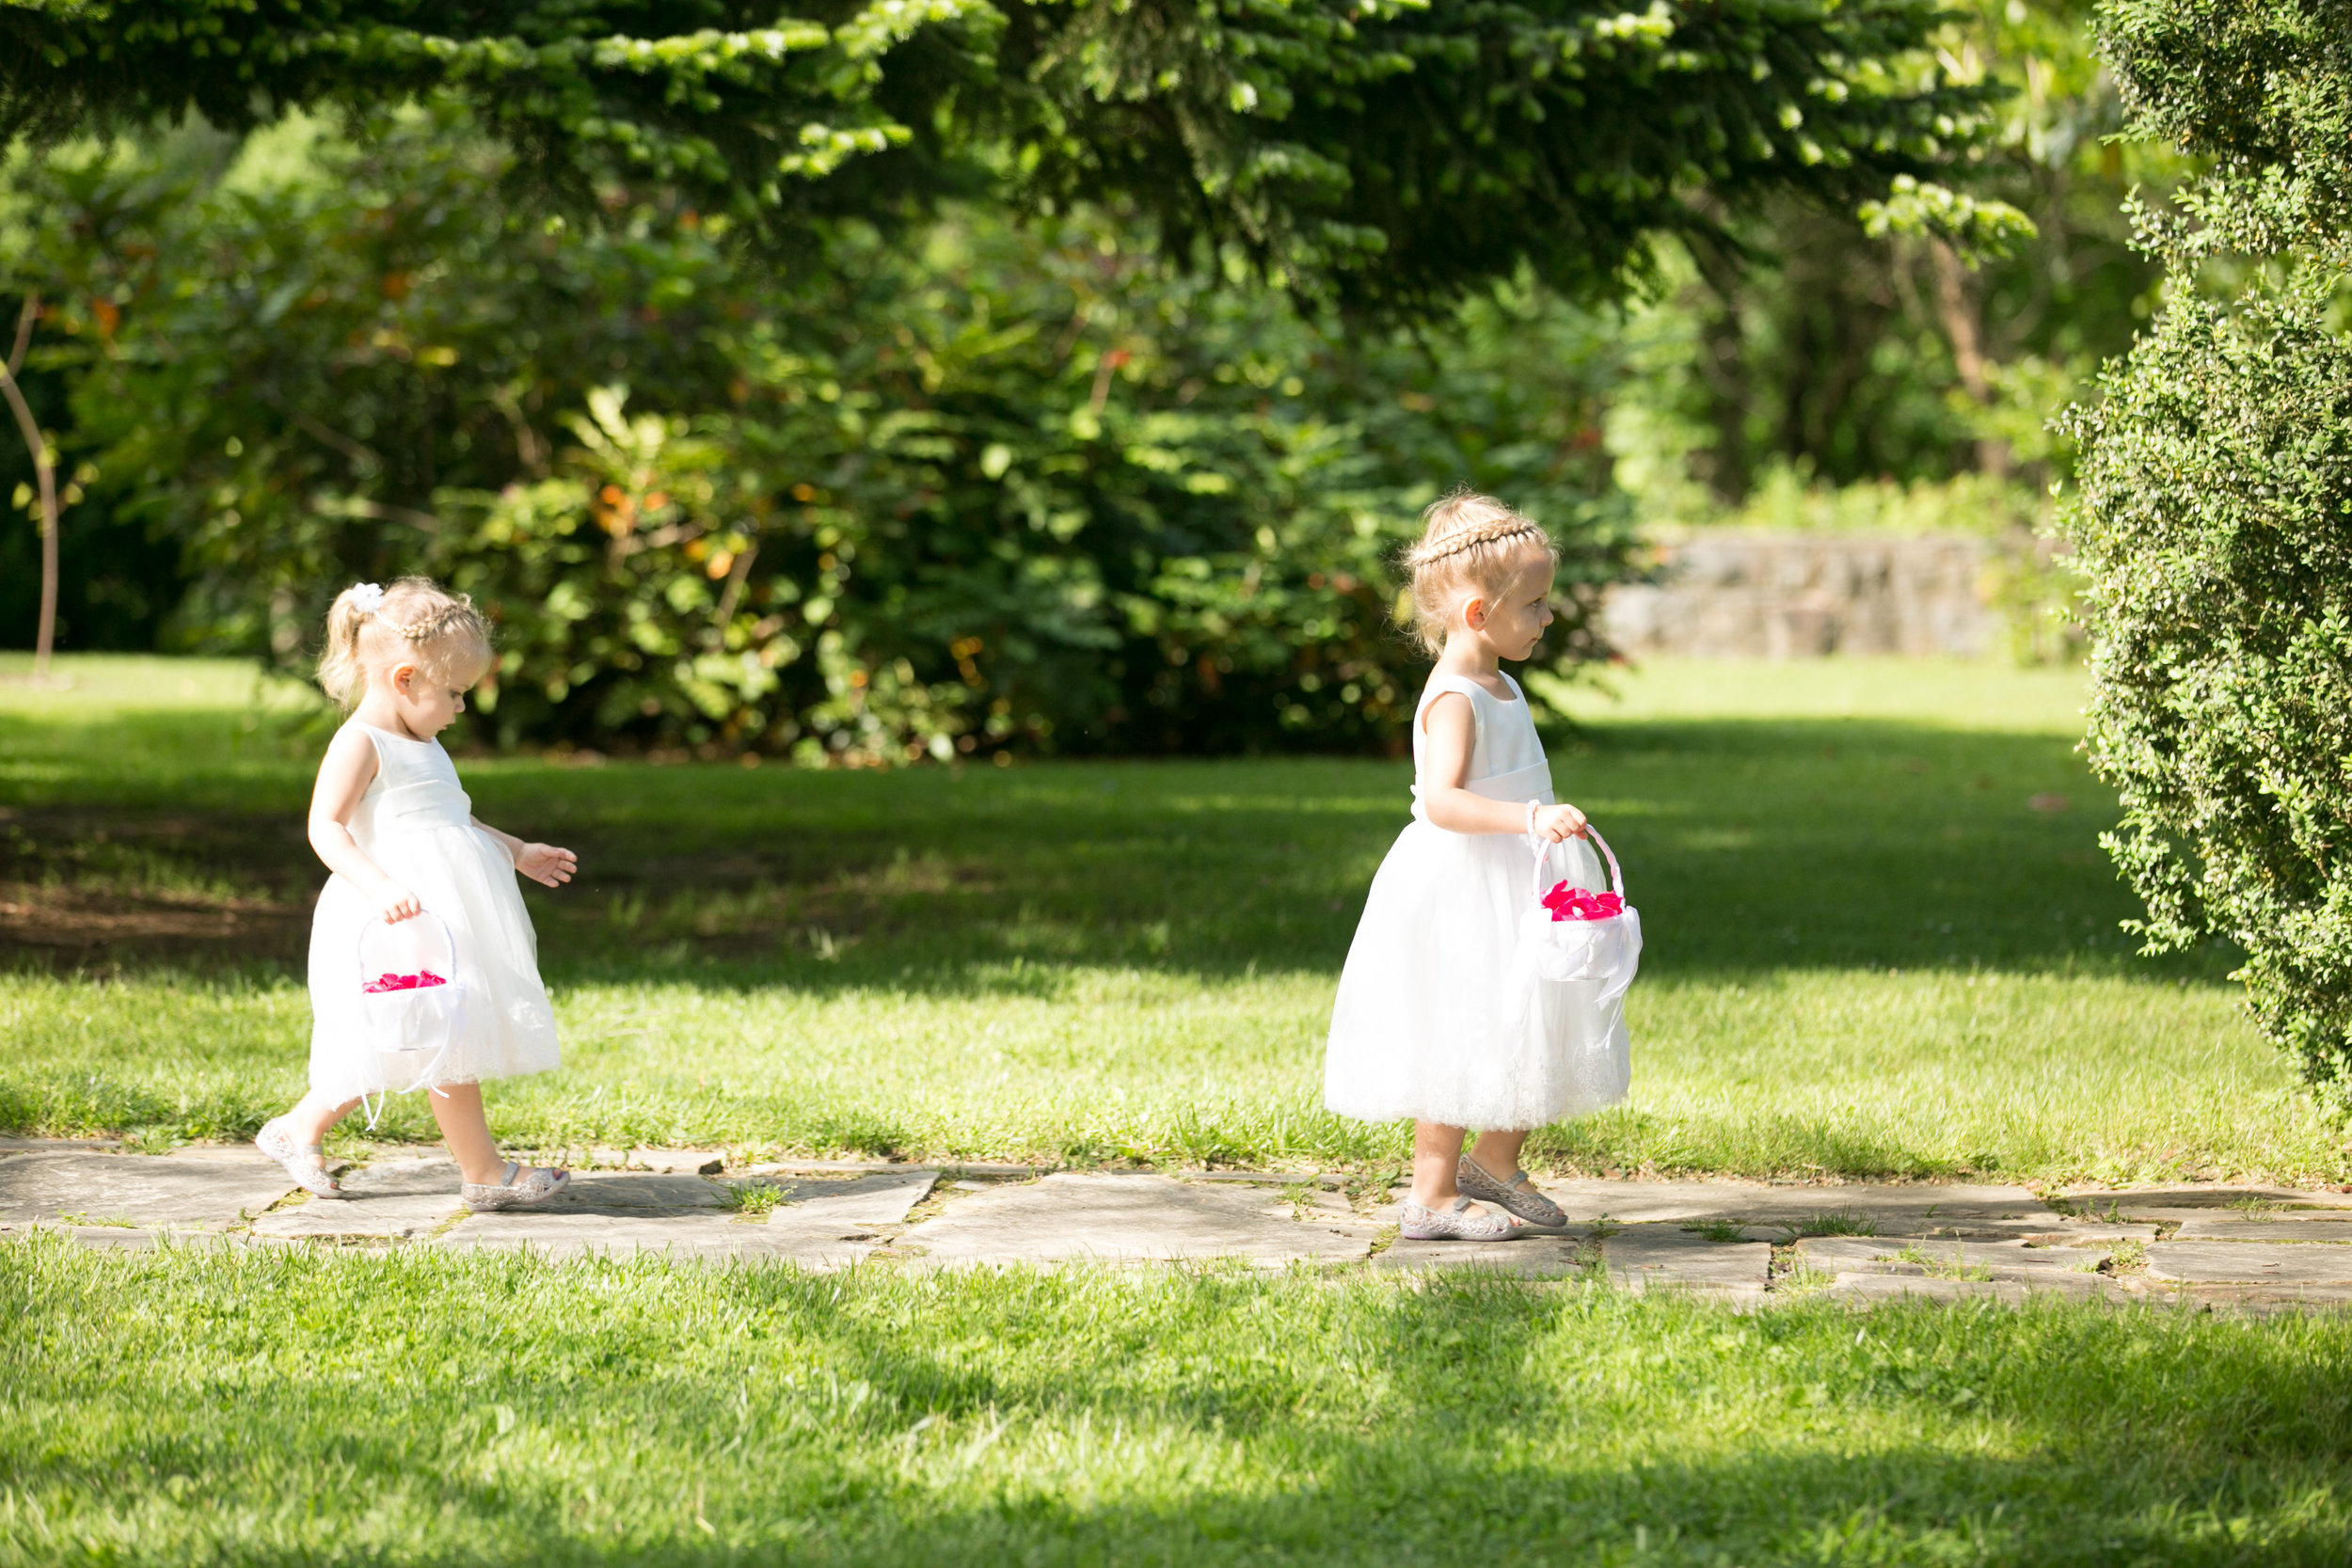 Pure elegance events Tynise Kee dc wedding planner va wedding planner rust manor house leesburg -0039.jpg